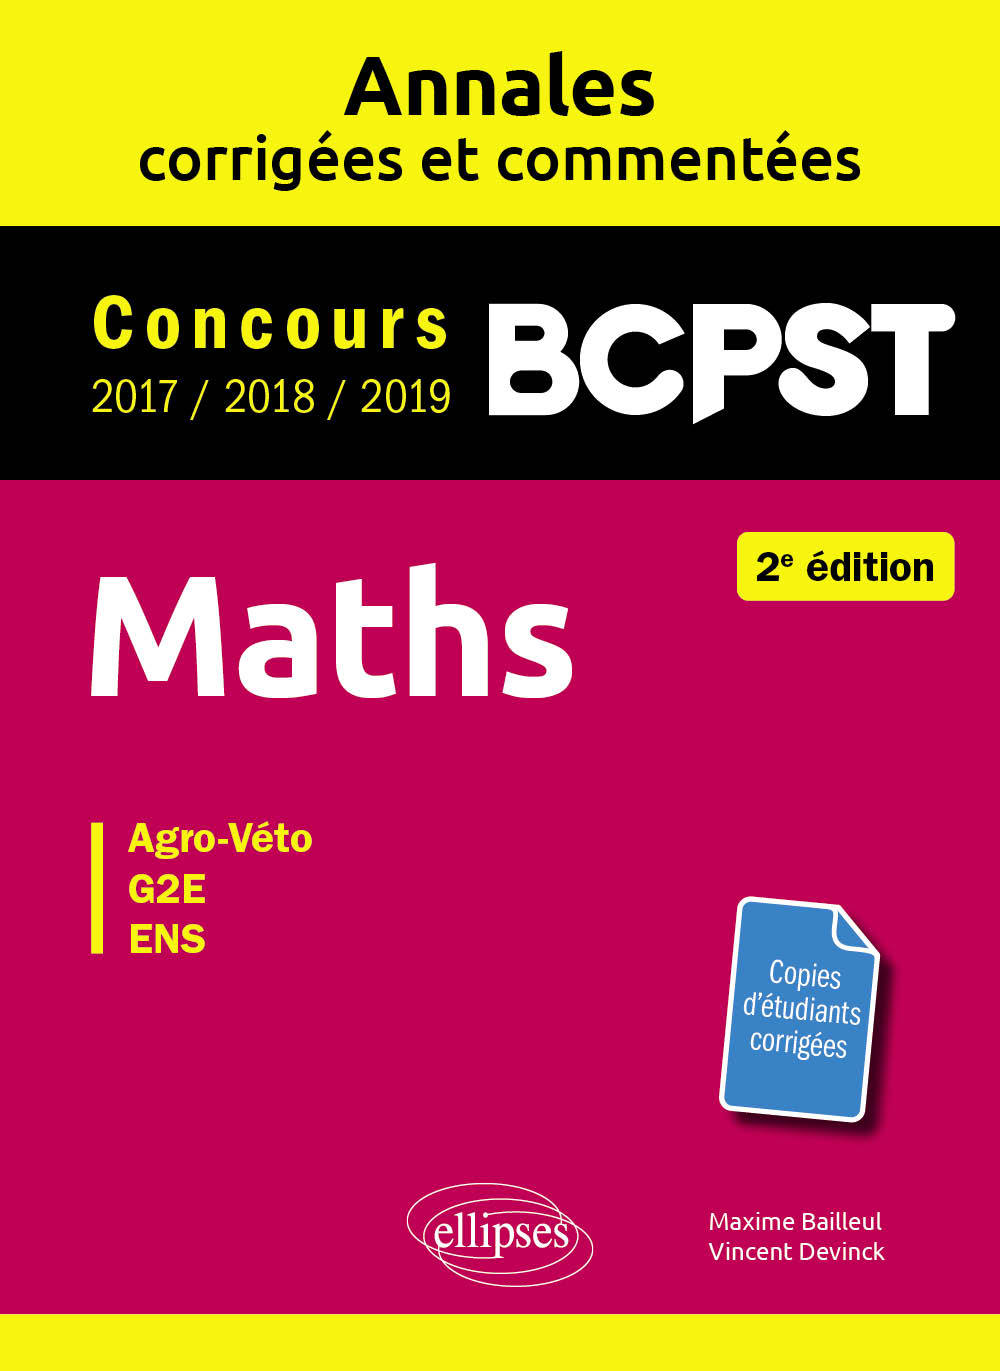 MATHS BCPST -  ANNALES CORRIGEES ET COMMENTEES 2017-2018-2019 - CONCOURS AGRO-VETO, G2E, ENS - 2E ED